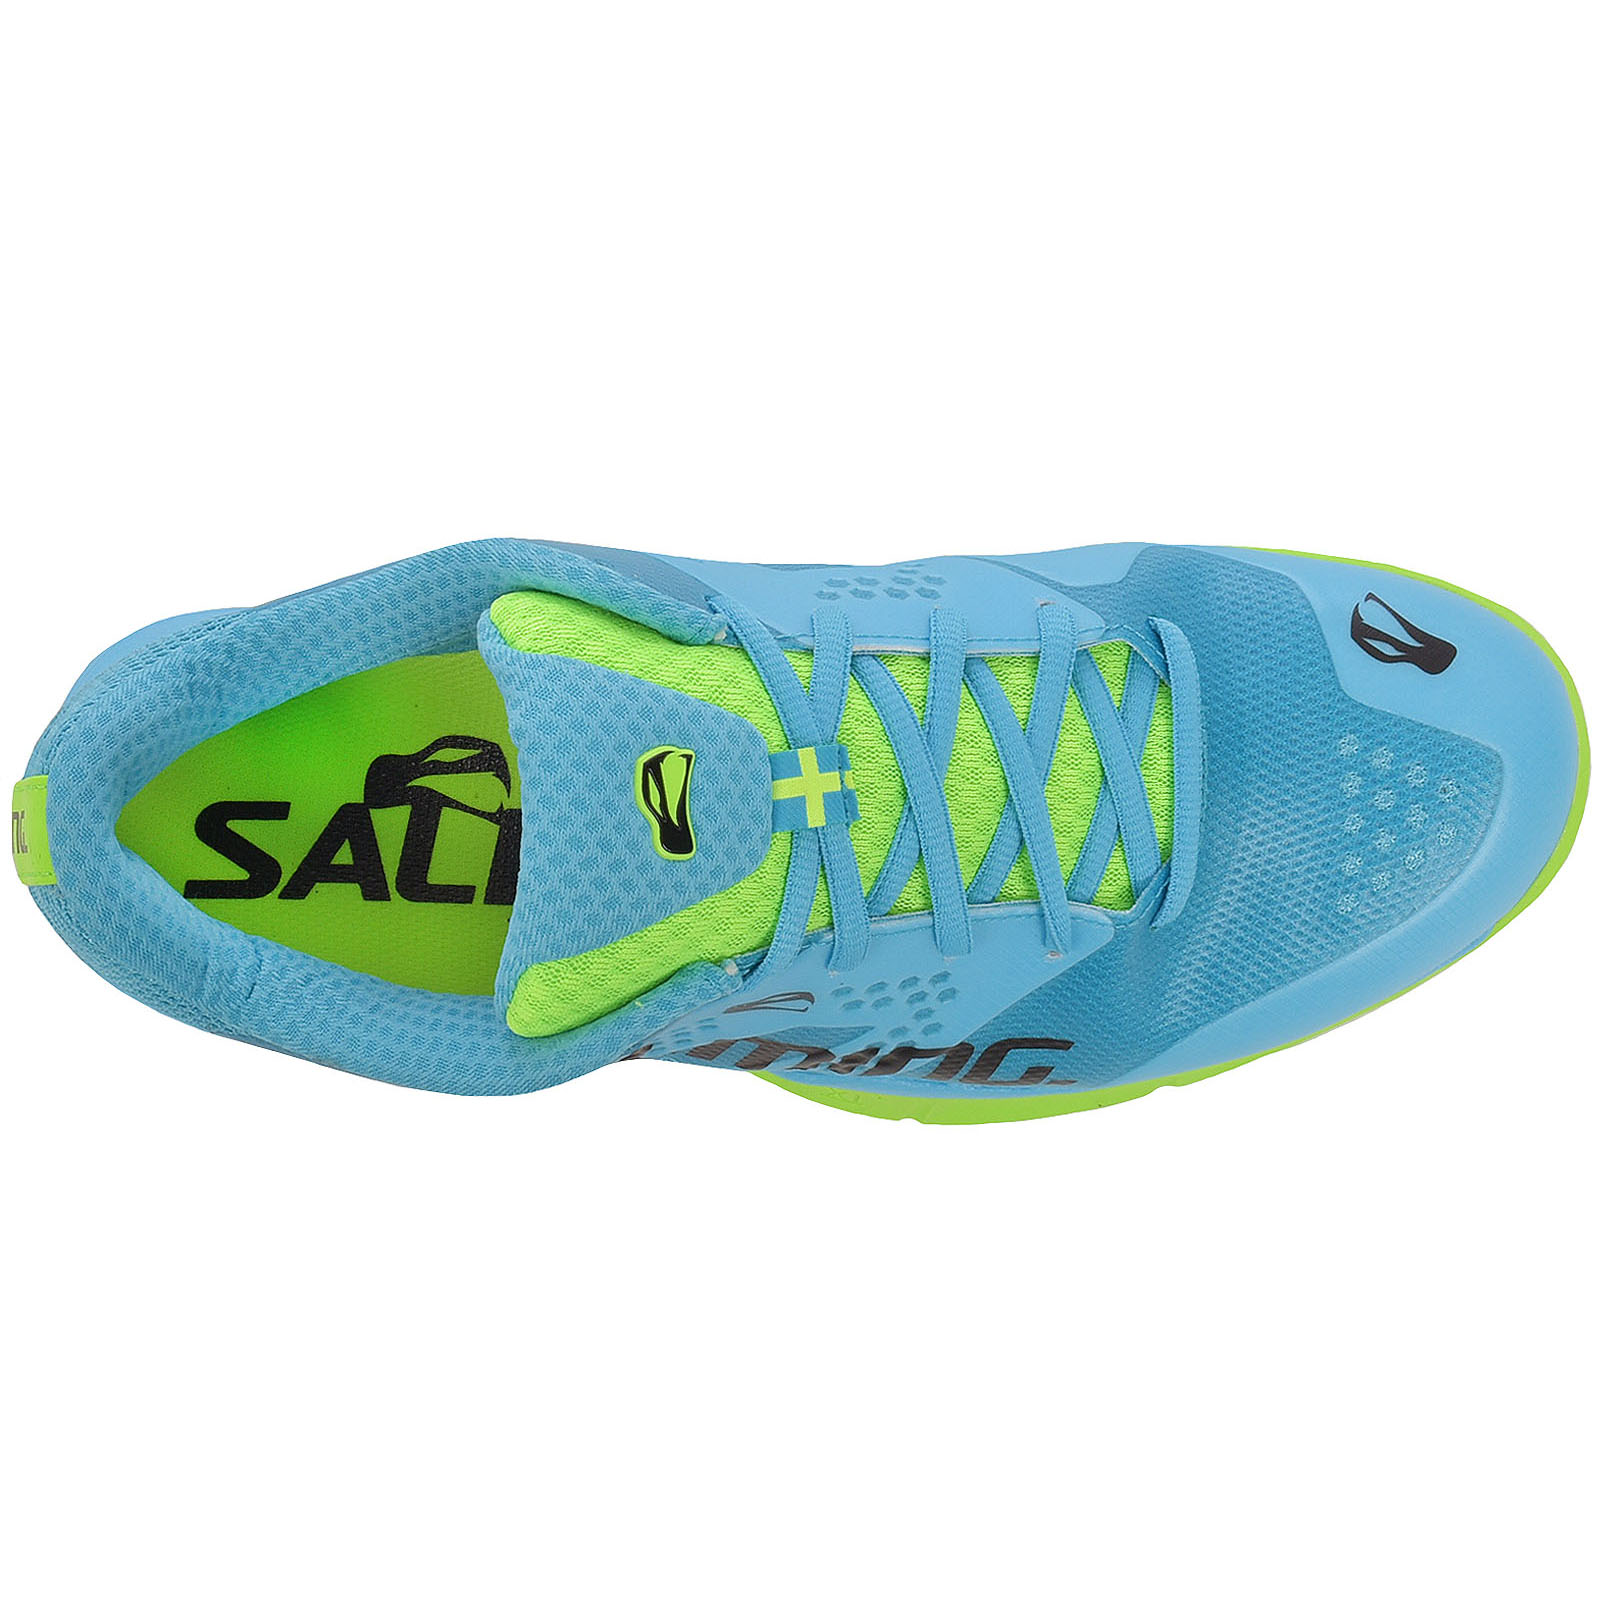 Salming Mens Viper5 Sports Indoor Court Badminton Squash Training Shoes Trainers